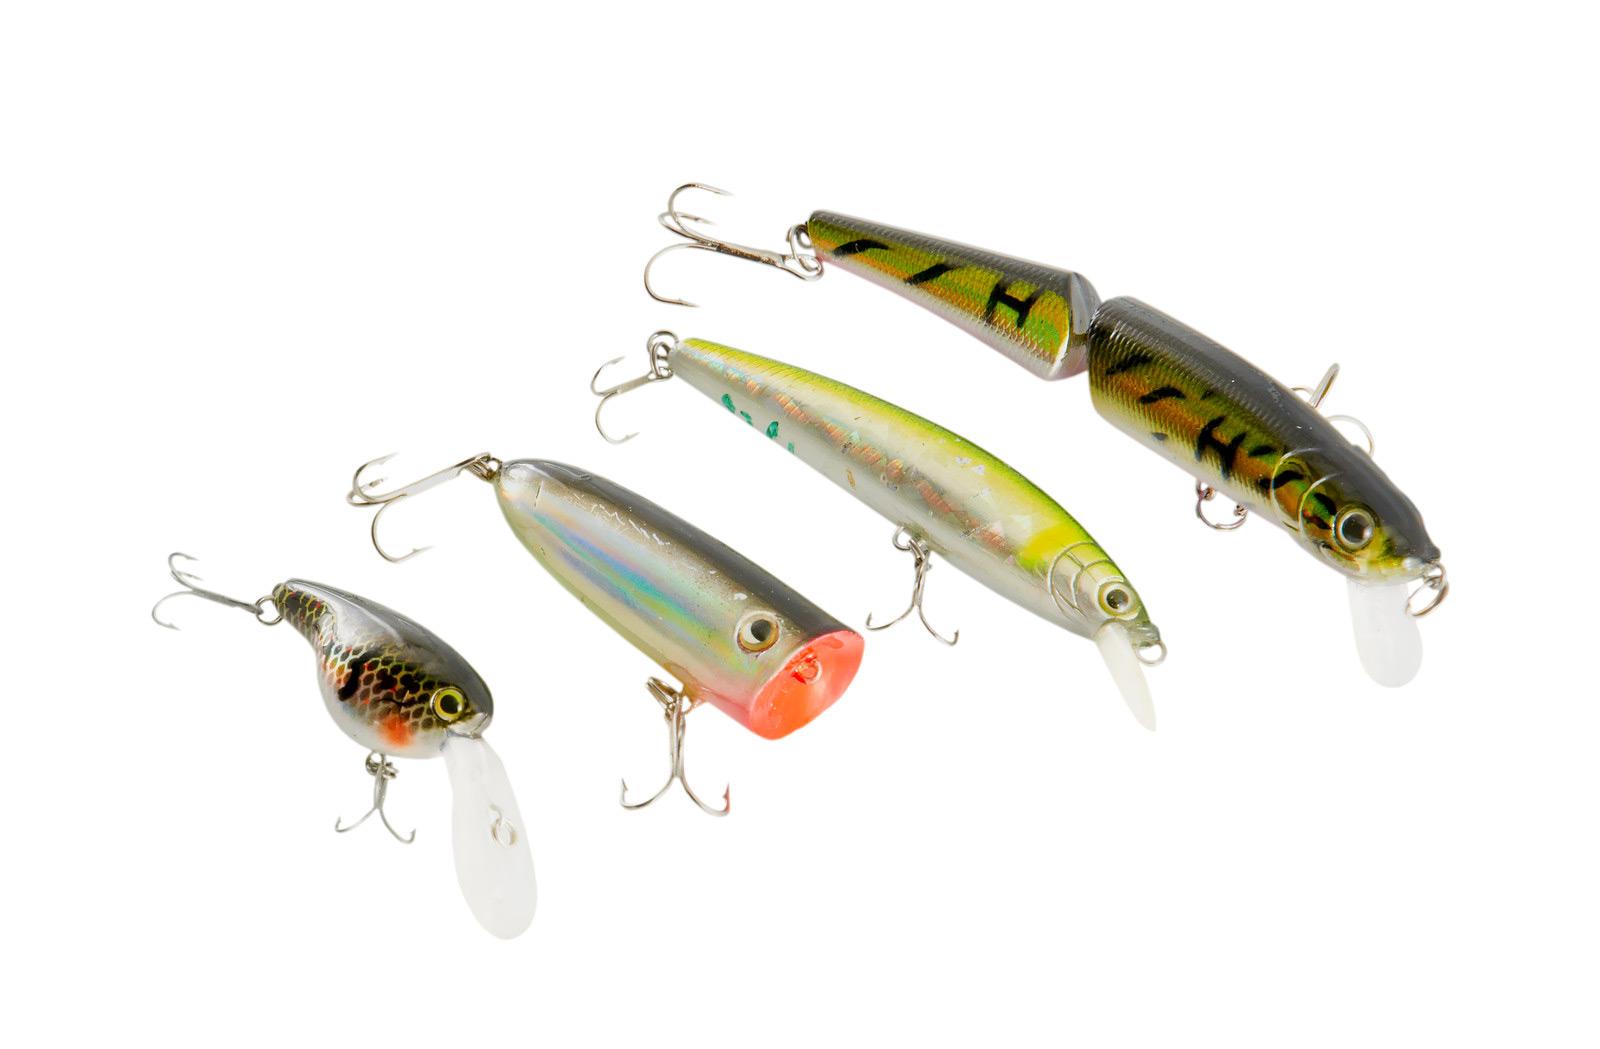 fishing with lures - take me fishing, Hard Baits